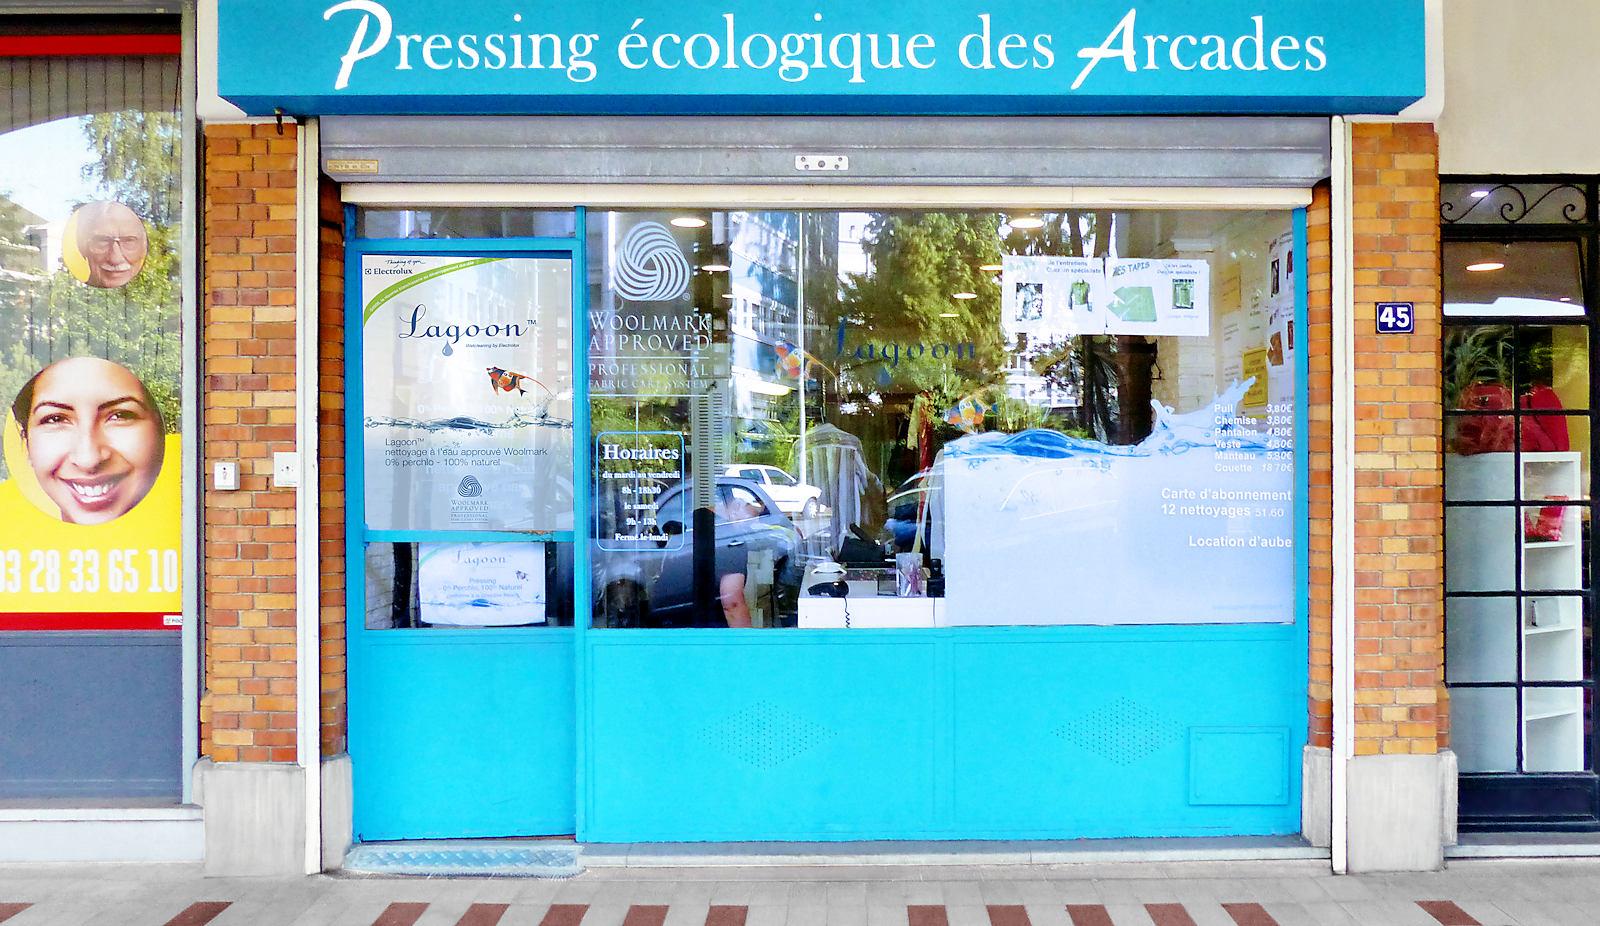 Arcades Tourcoing - Pressing écologique